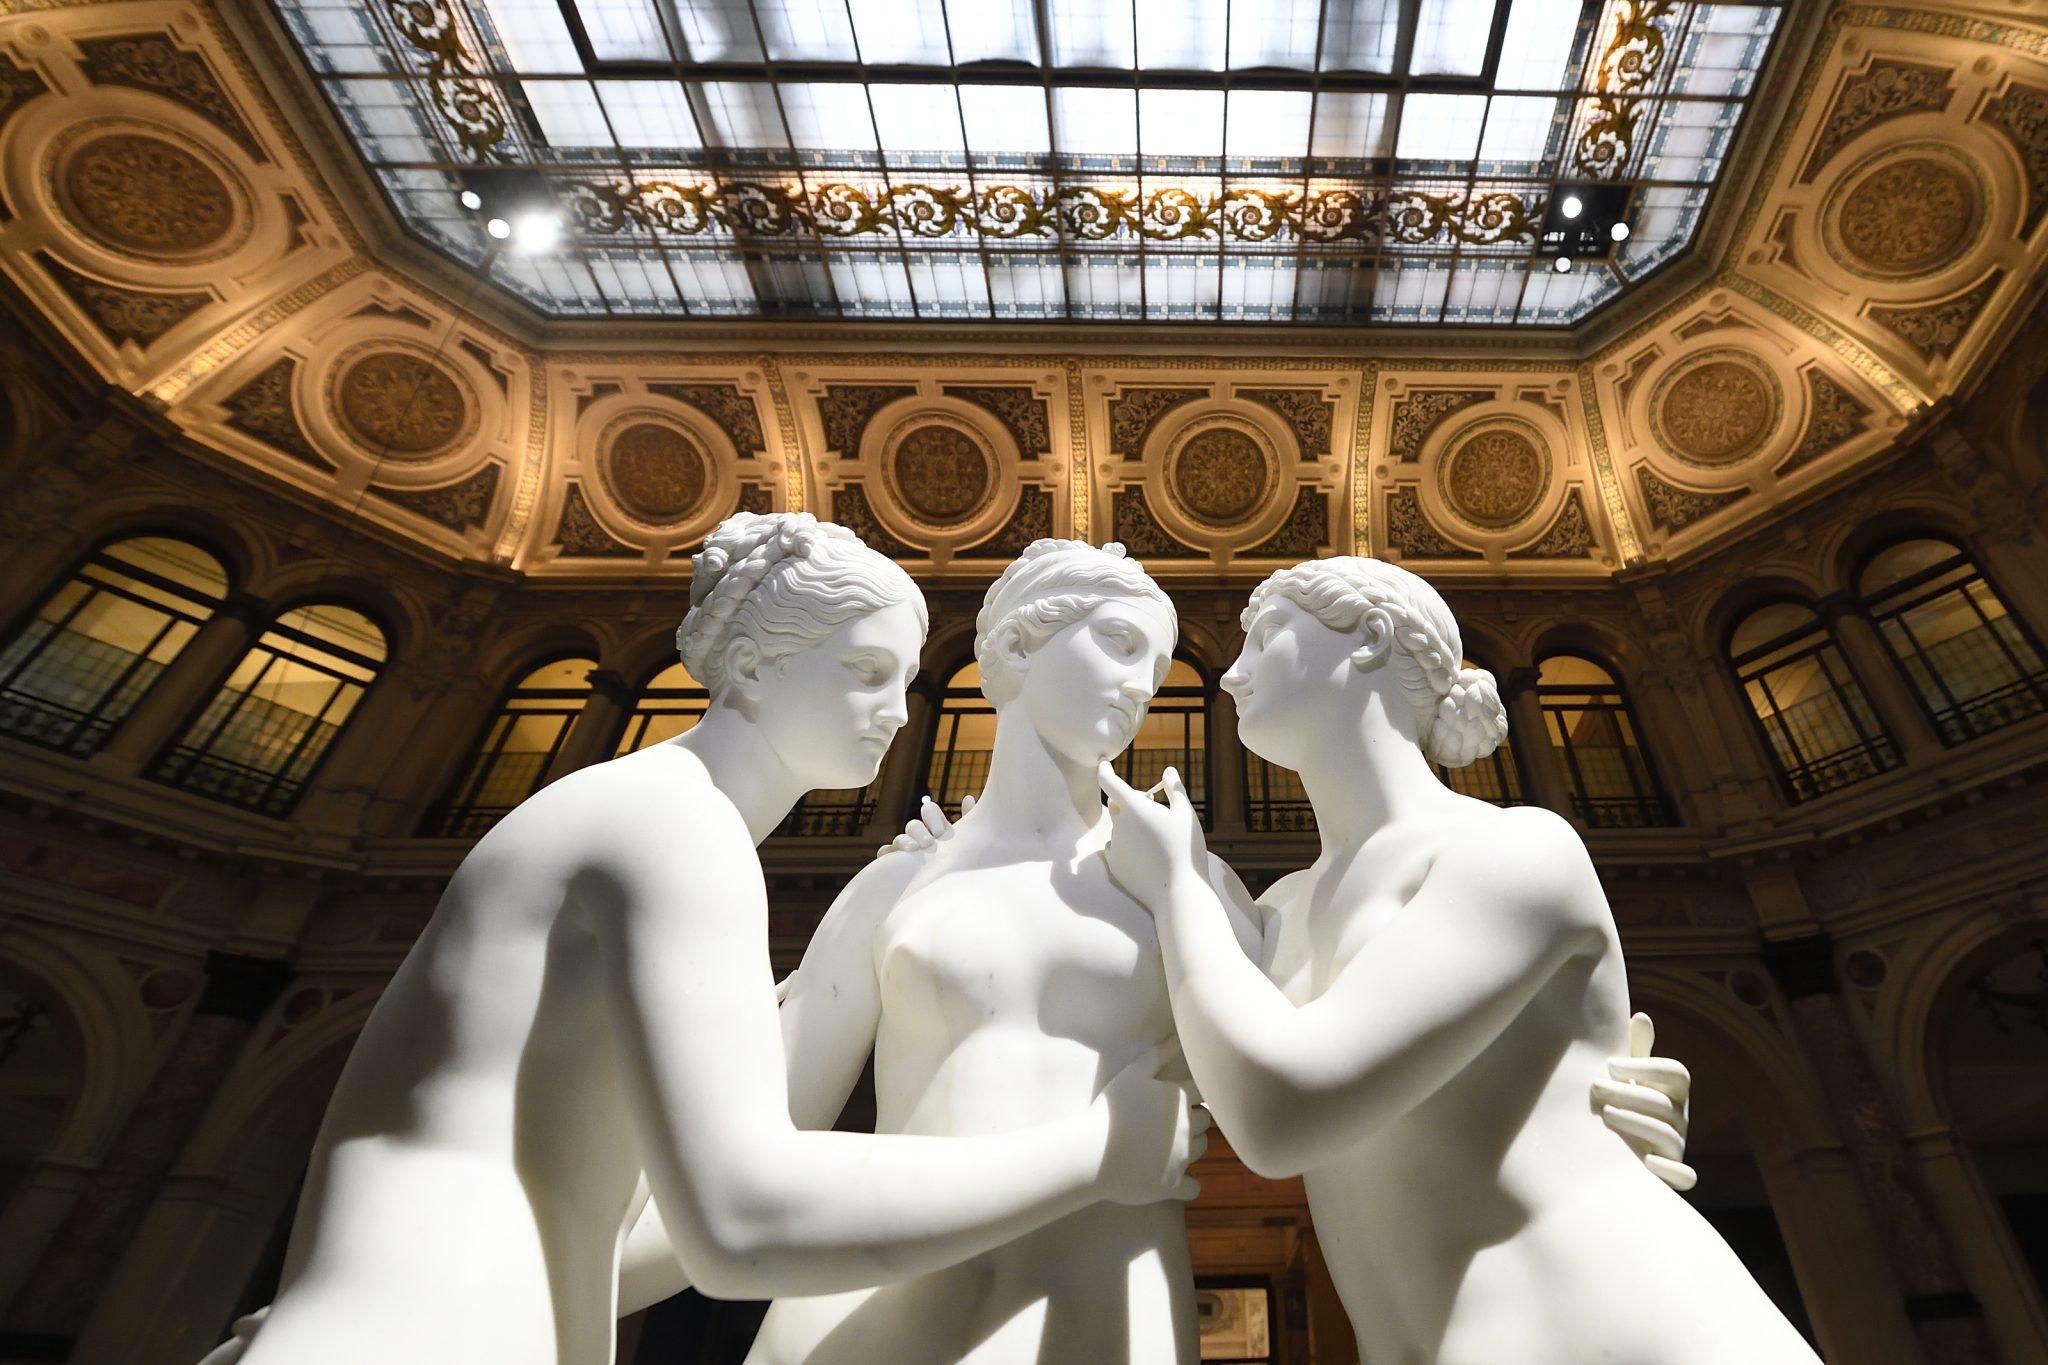 Canova | Thorvaldsen. La nascita della scultura moderna, Gallerie d'Italia, Milano. Bertel Thorvaldsen, Le tre Grazie